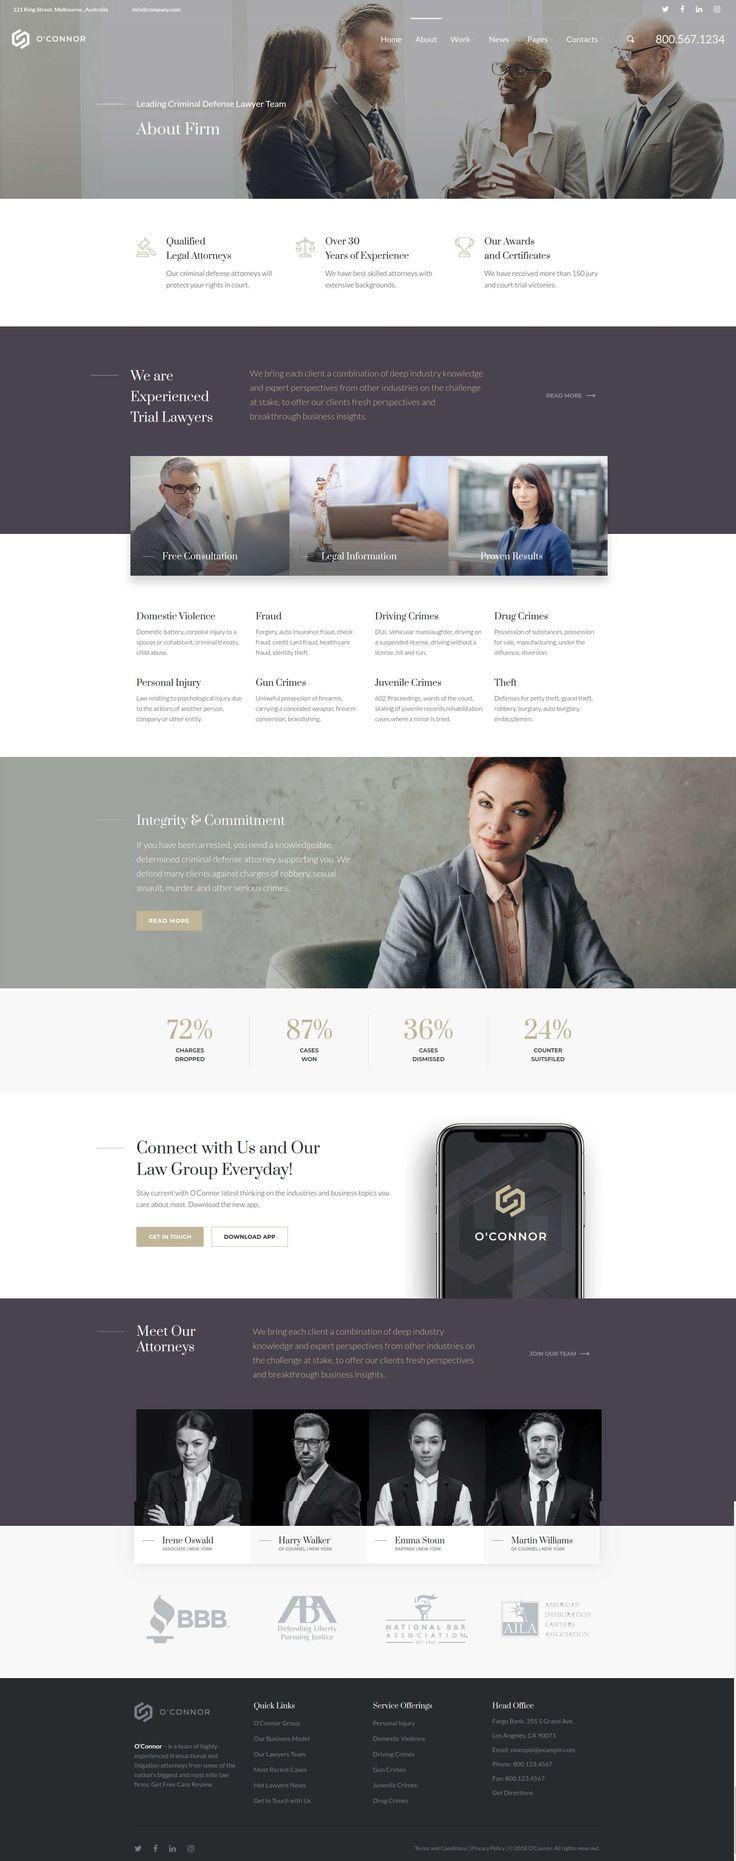 Oconnor Legal Professionals Attorneys And Legislation Agency Wordpress Theme Attorneys Firm L Law Firm Website Design Law Firm Website Law Firm Branding